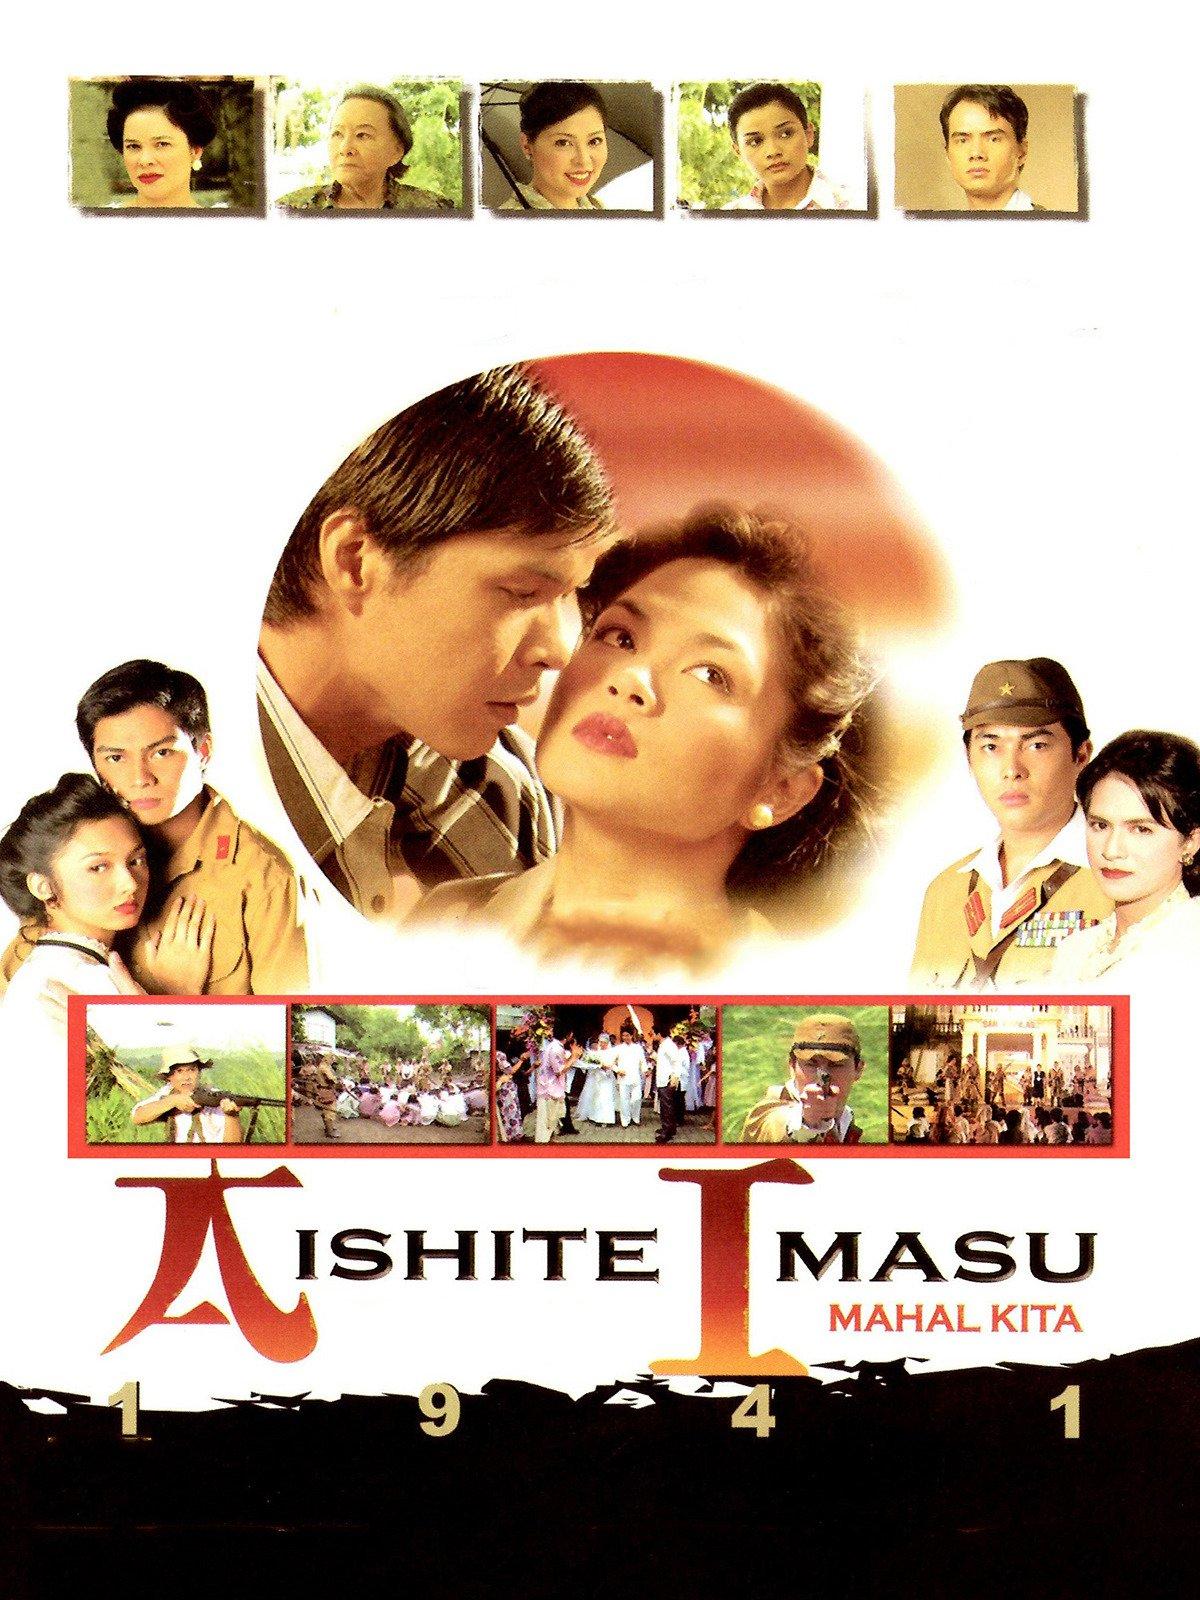 Aishite imasu (Mahal kita) 1941 on Amazon Prime Video UK